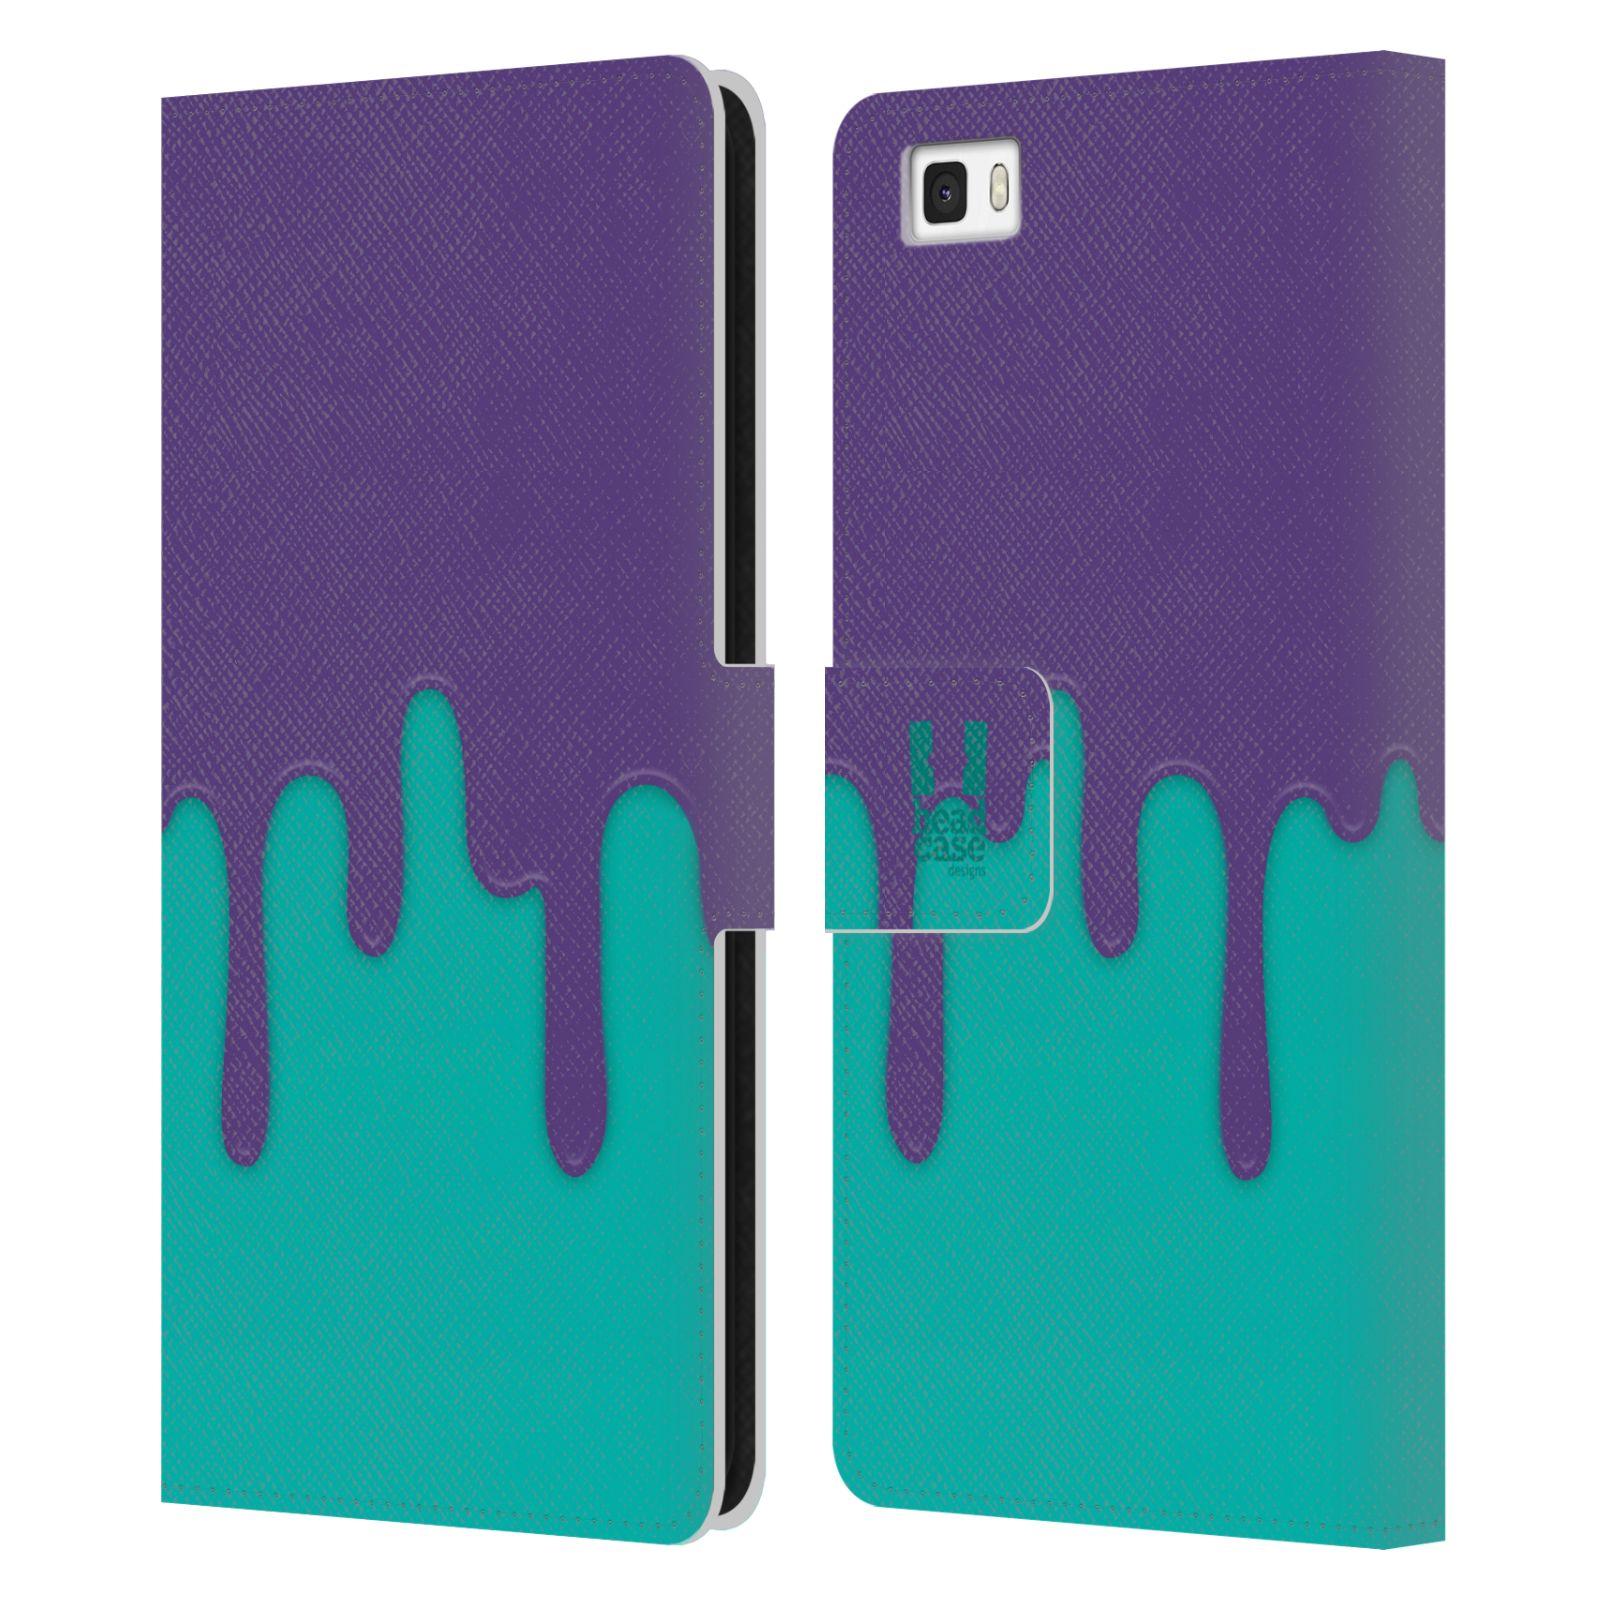 HEAD CASE Flipové pouzdro pro mobil Huawei P8 LITE Rozlitá barva fialová a tyrkysová